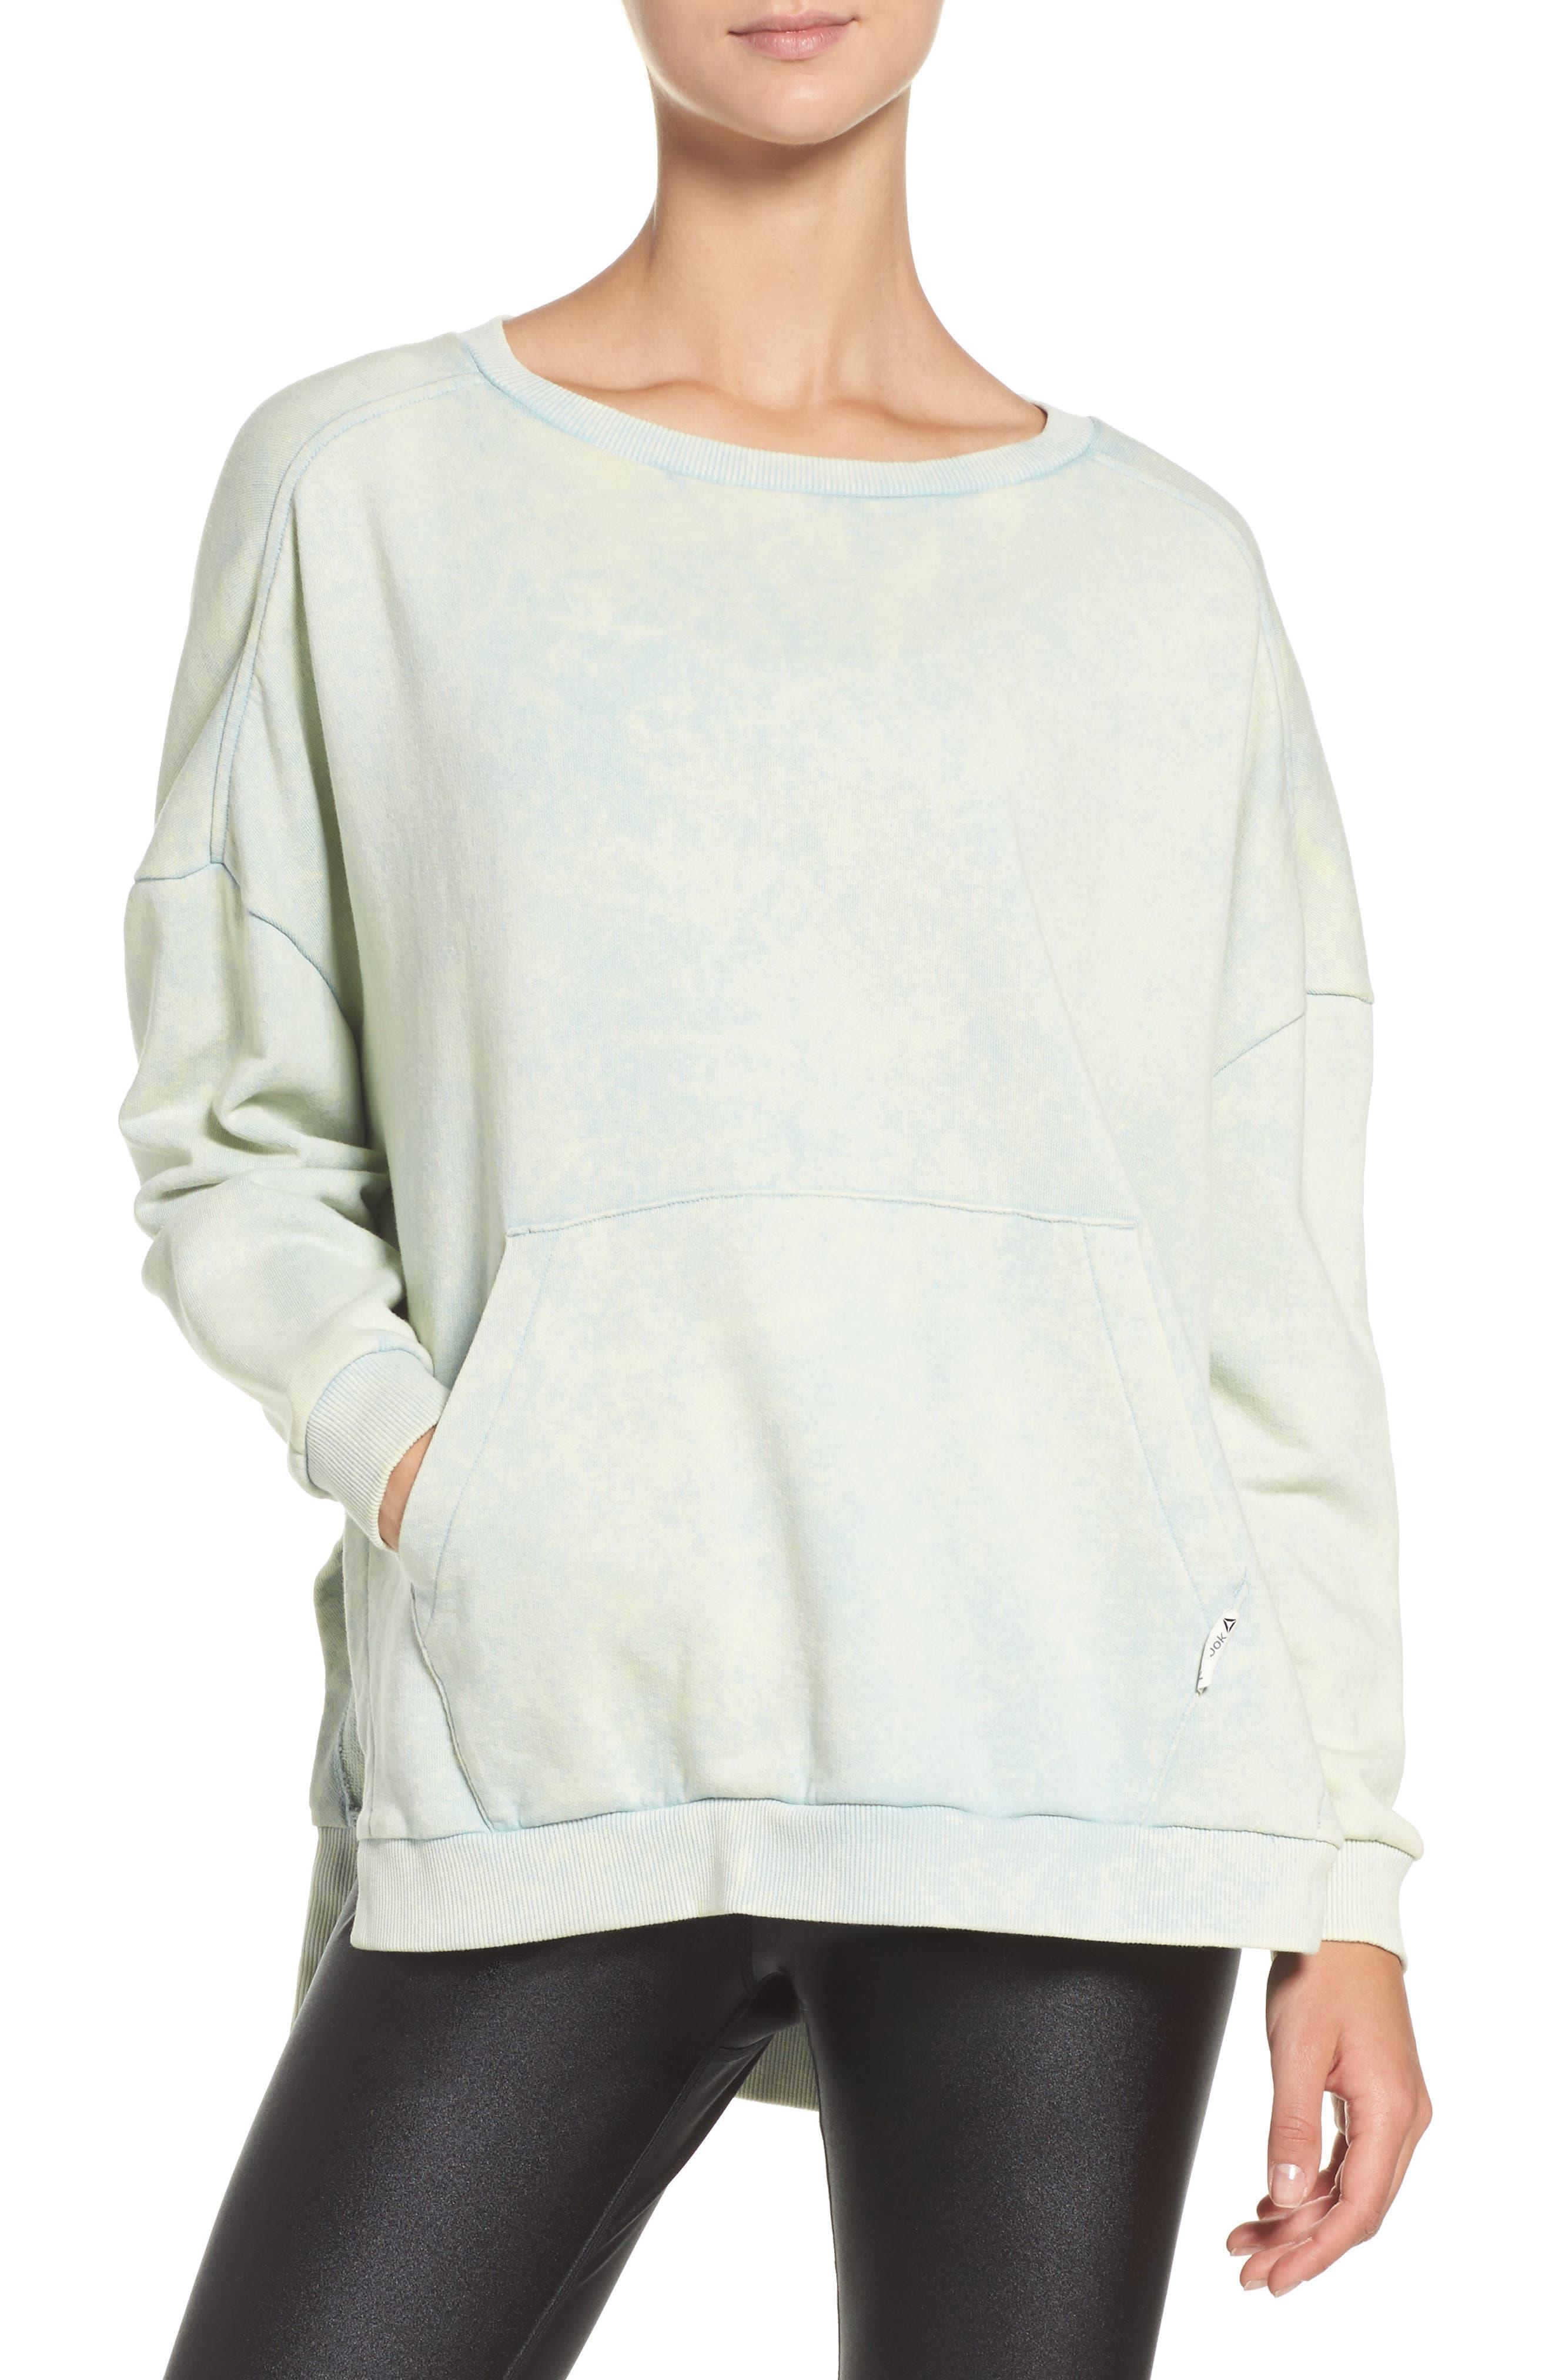 Reebok Favorite Oversized Sweatshirt